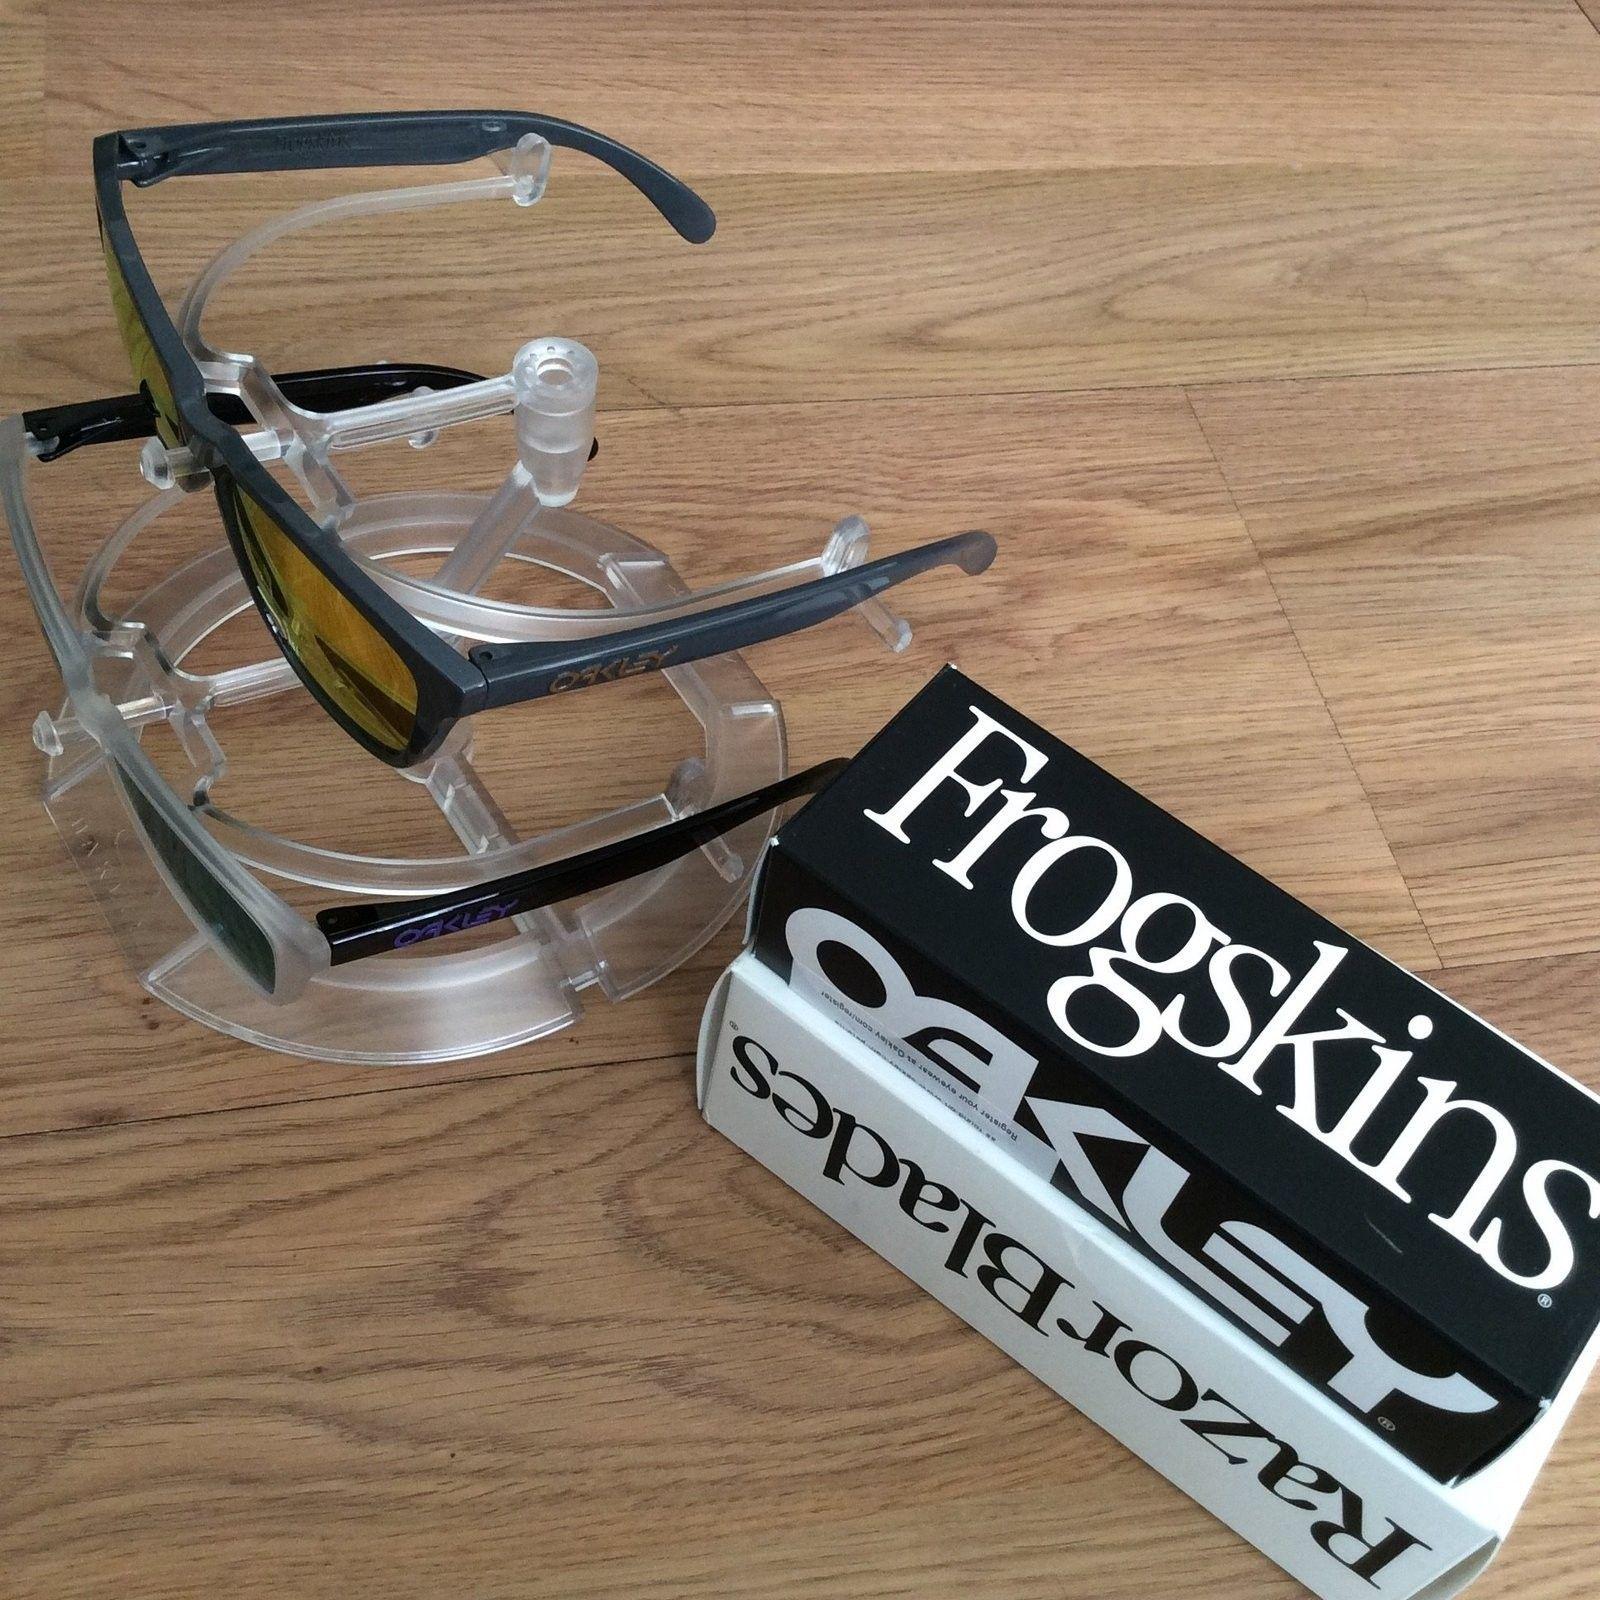 Heritage/Blast Frogskins $110 shipped - image.jpg